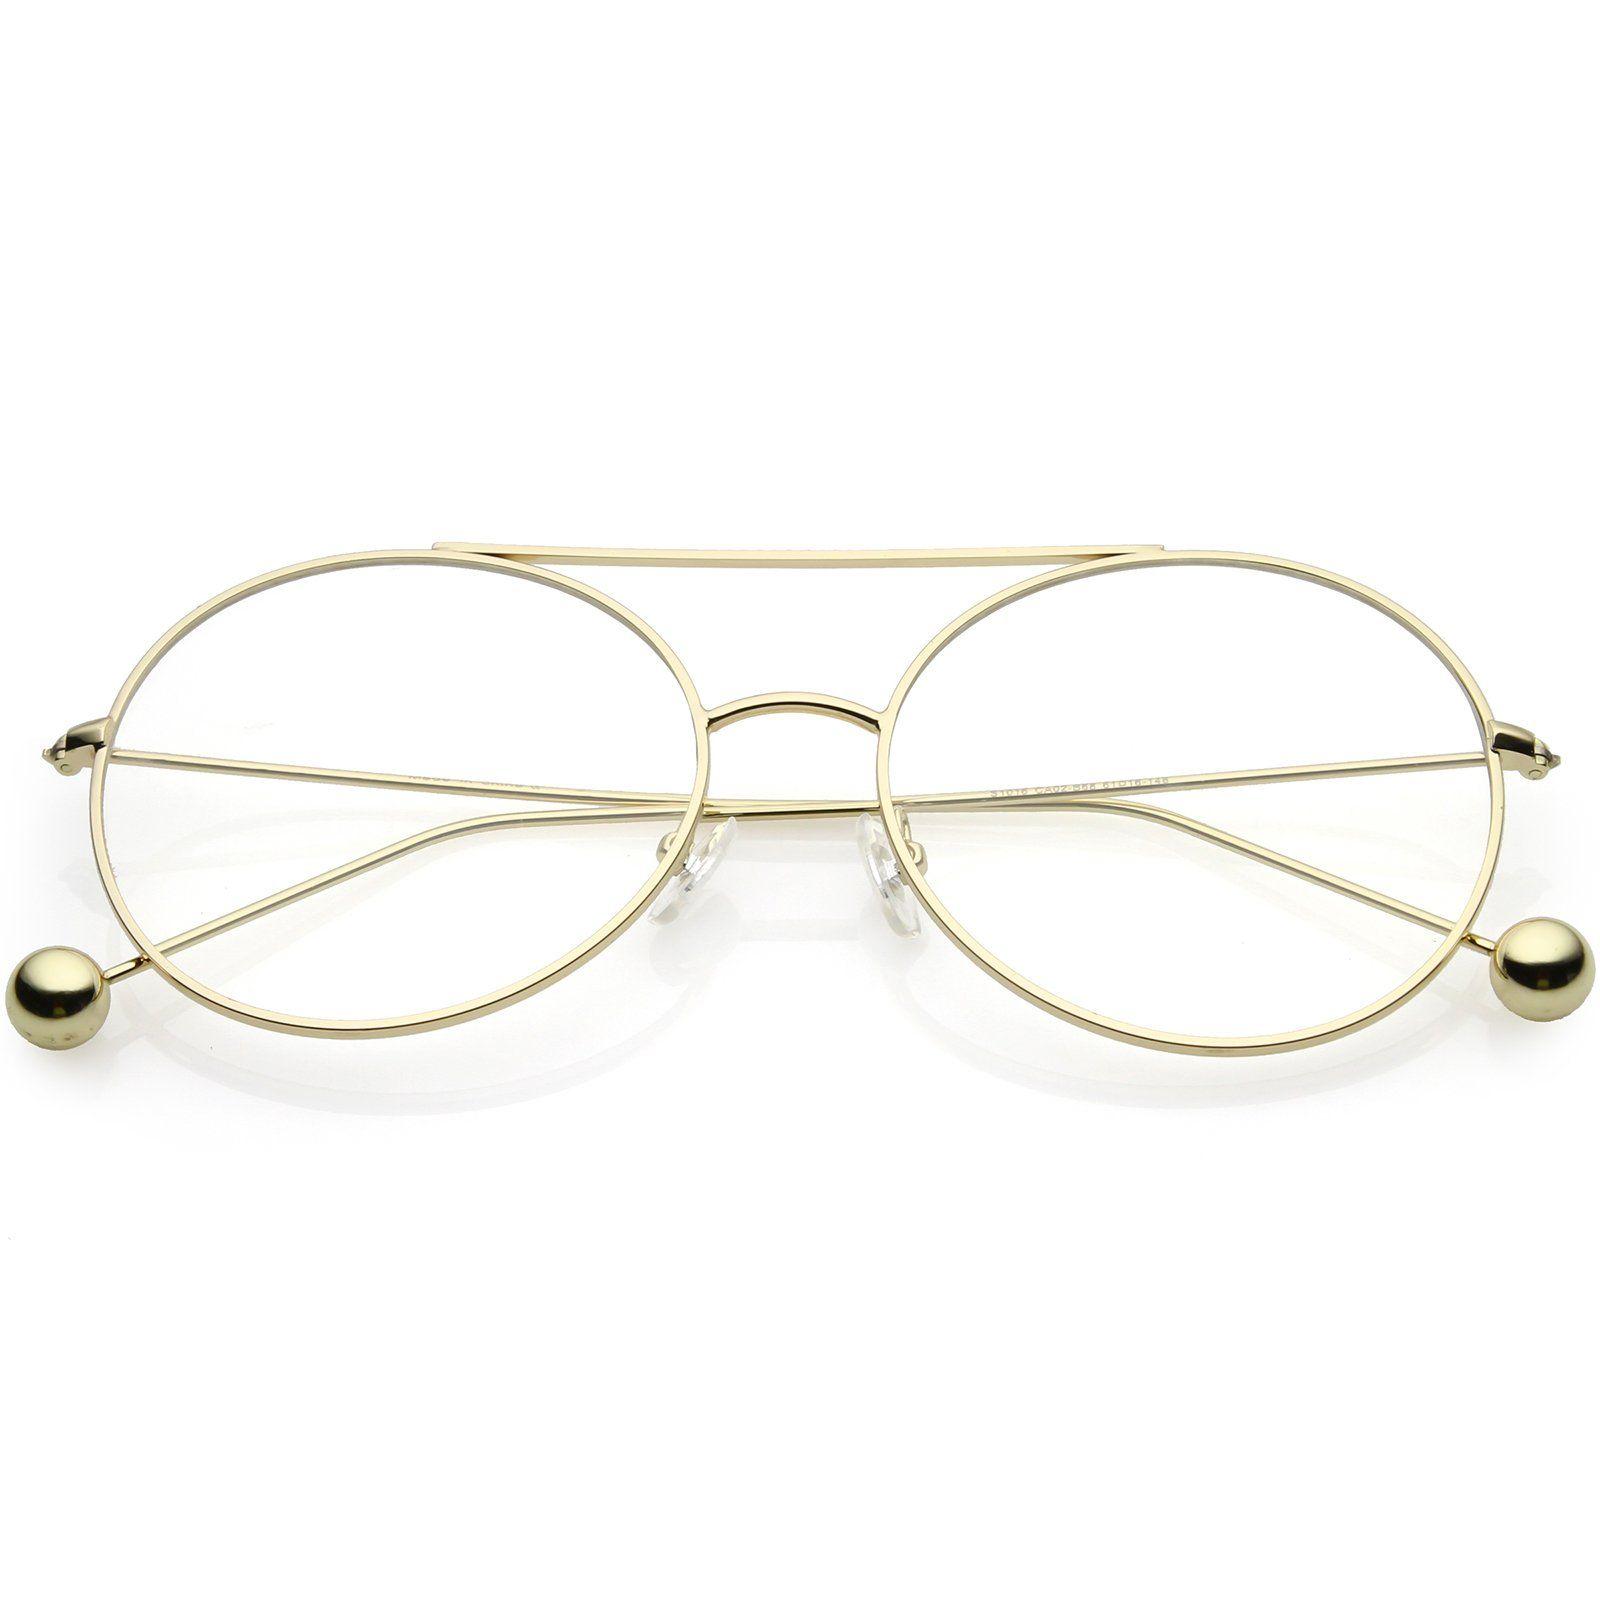 c9f961efcd8 Premium Oversize Round Eyeglasses Metal Double Nose Bridge Clear Flat Lens  59mm  frame  clear  mirrored  sunglassla  womens  sunglasses  bold  purple  ...